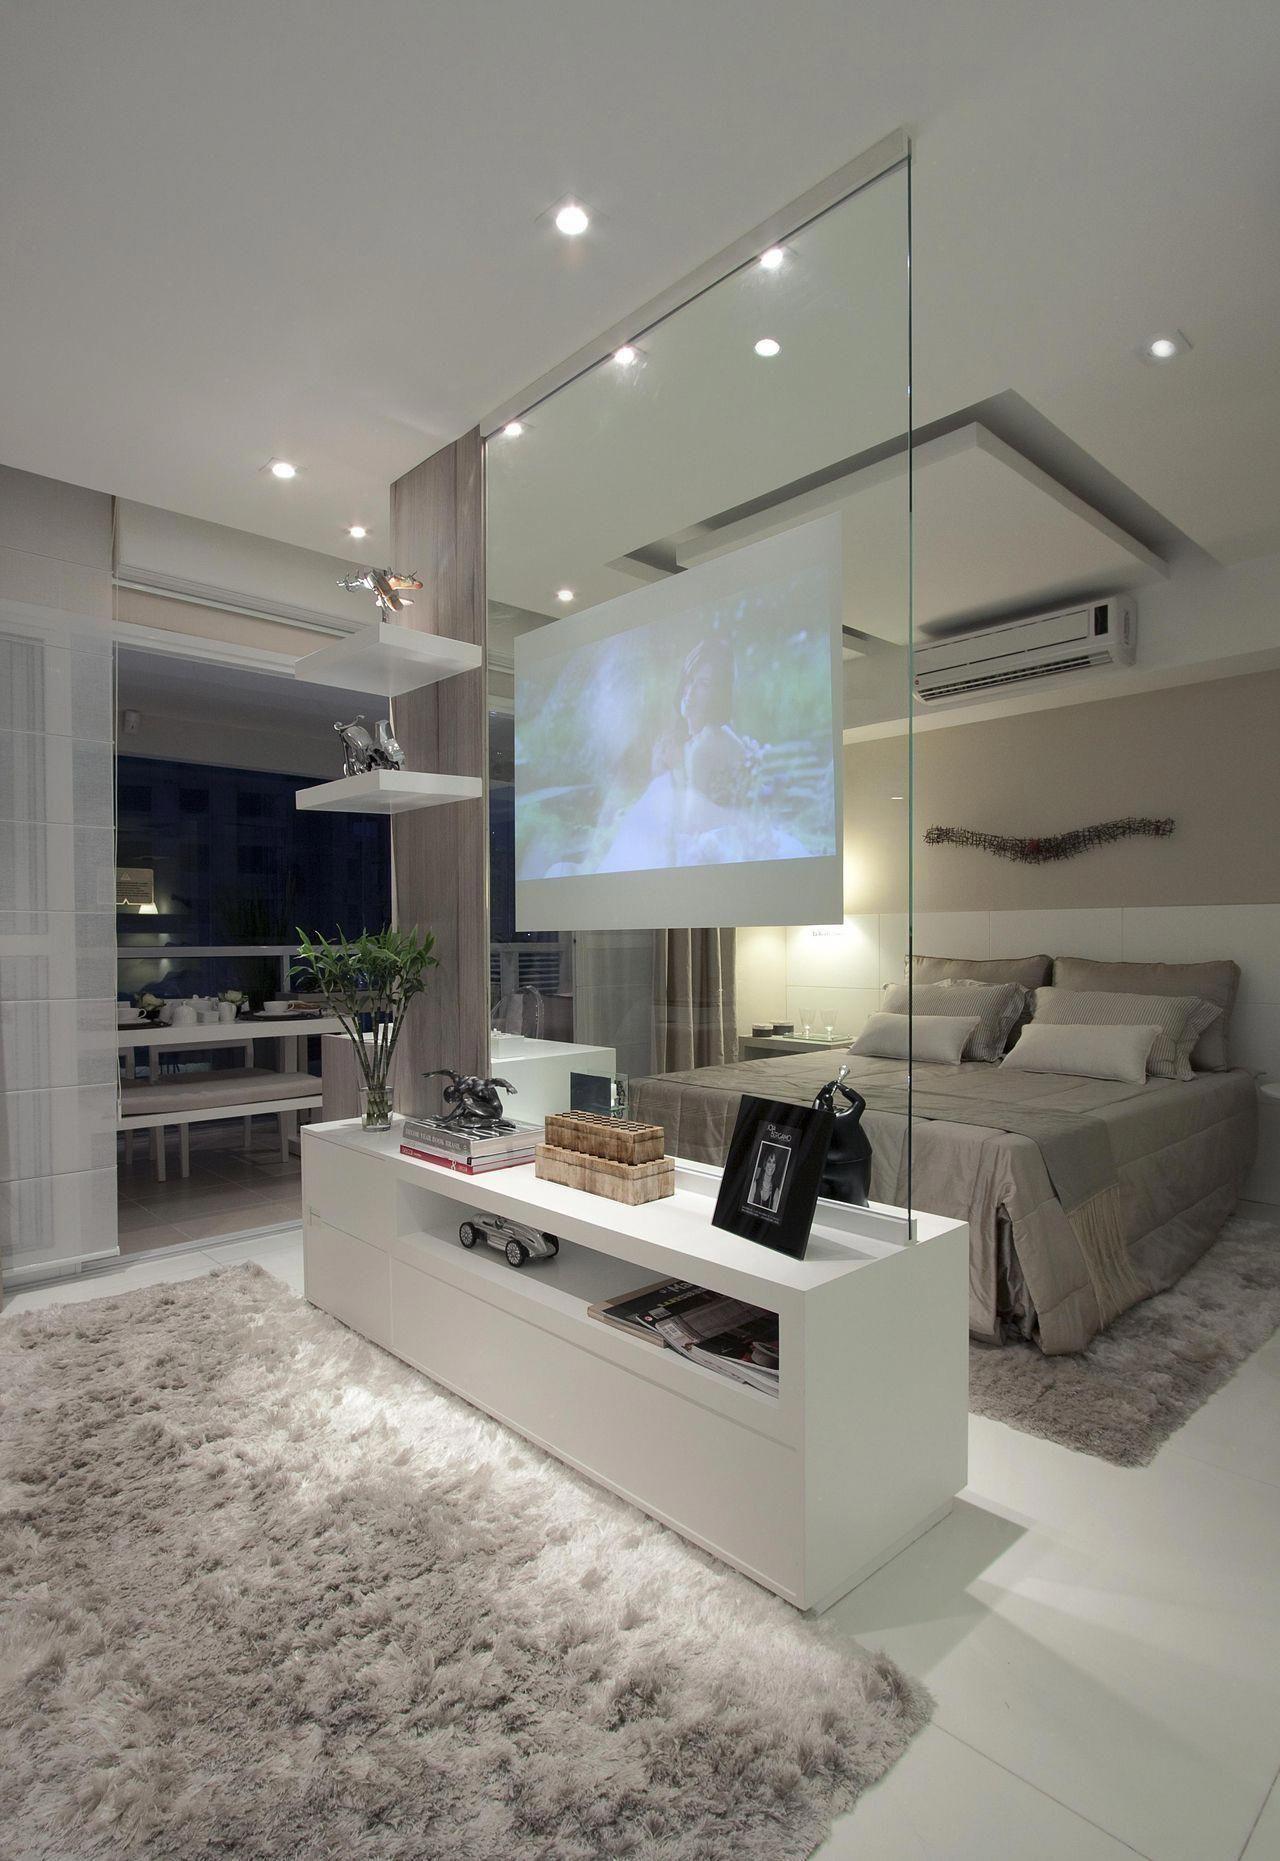 Melissa Deco Bedroomdecor Bedroom Decoration Chambre